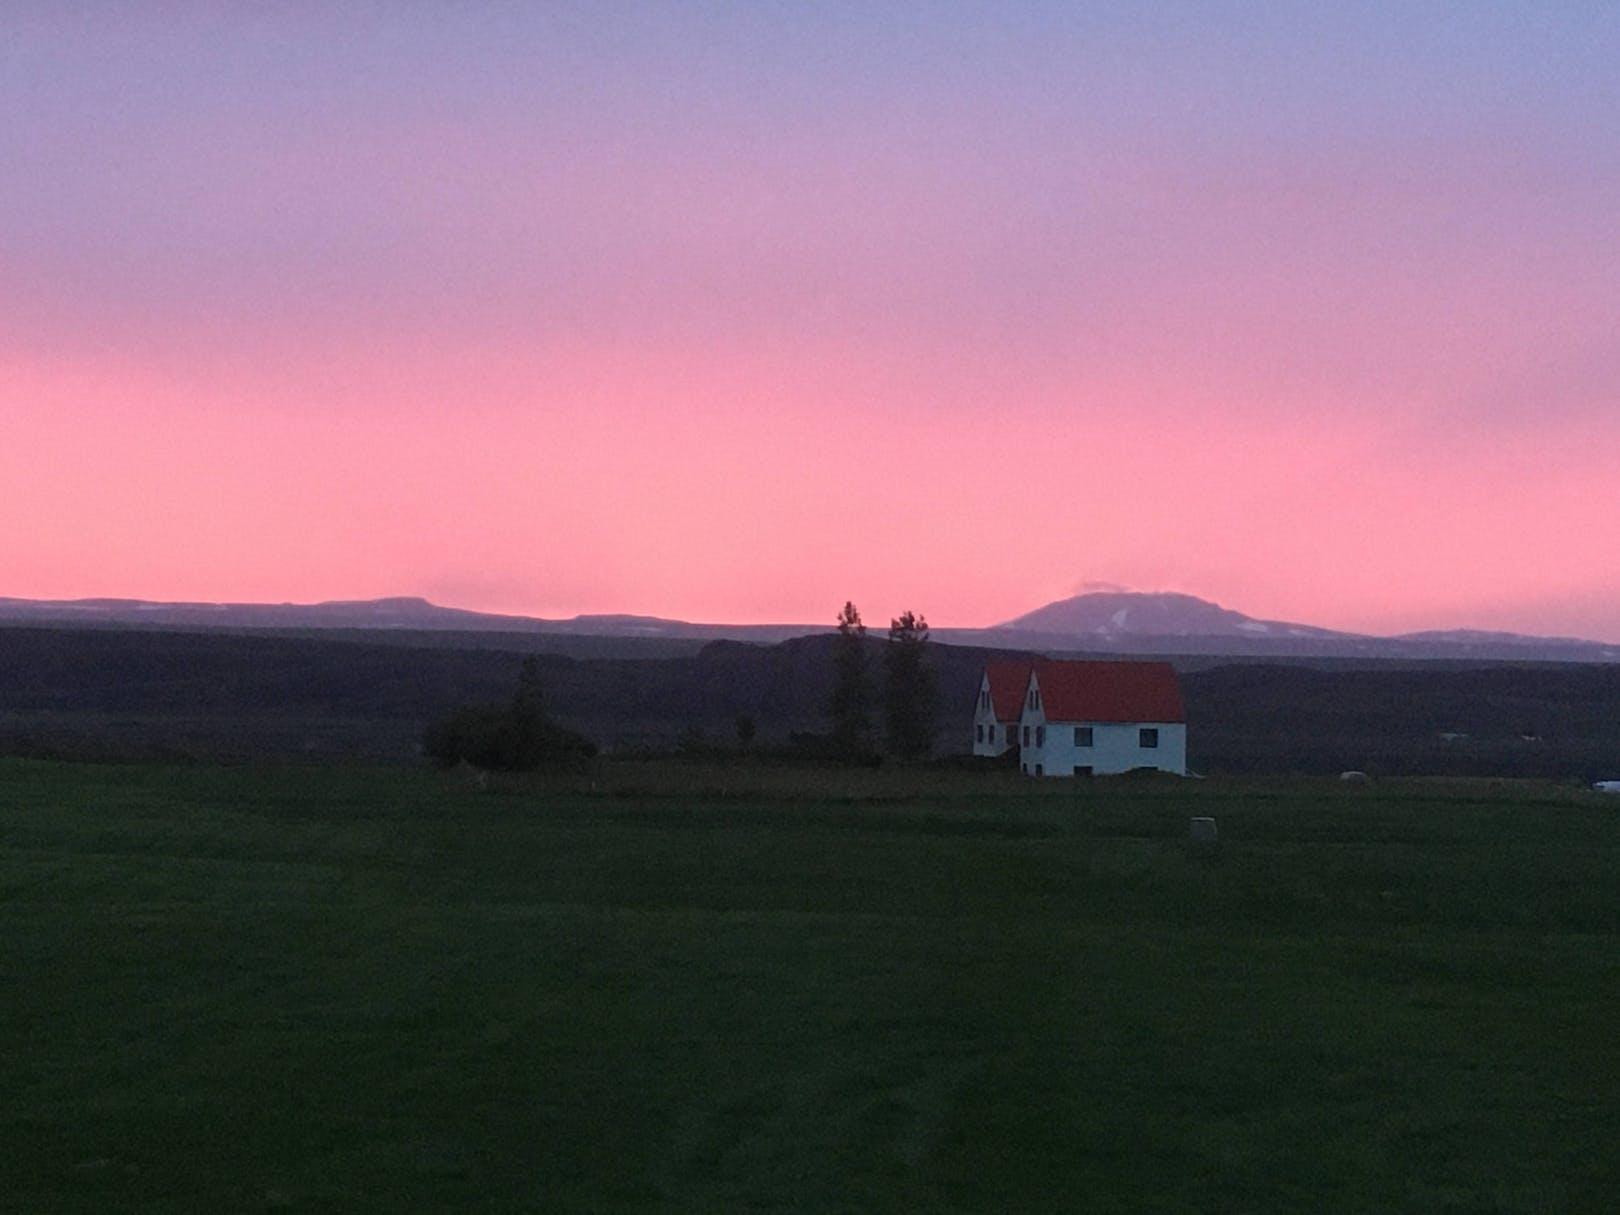 BHM Orlofssjóður